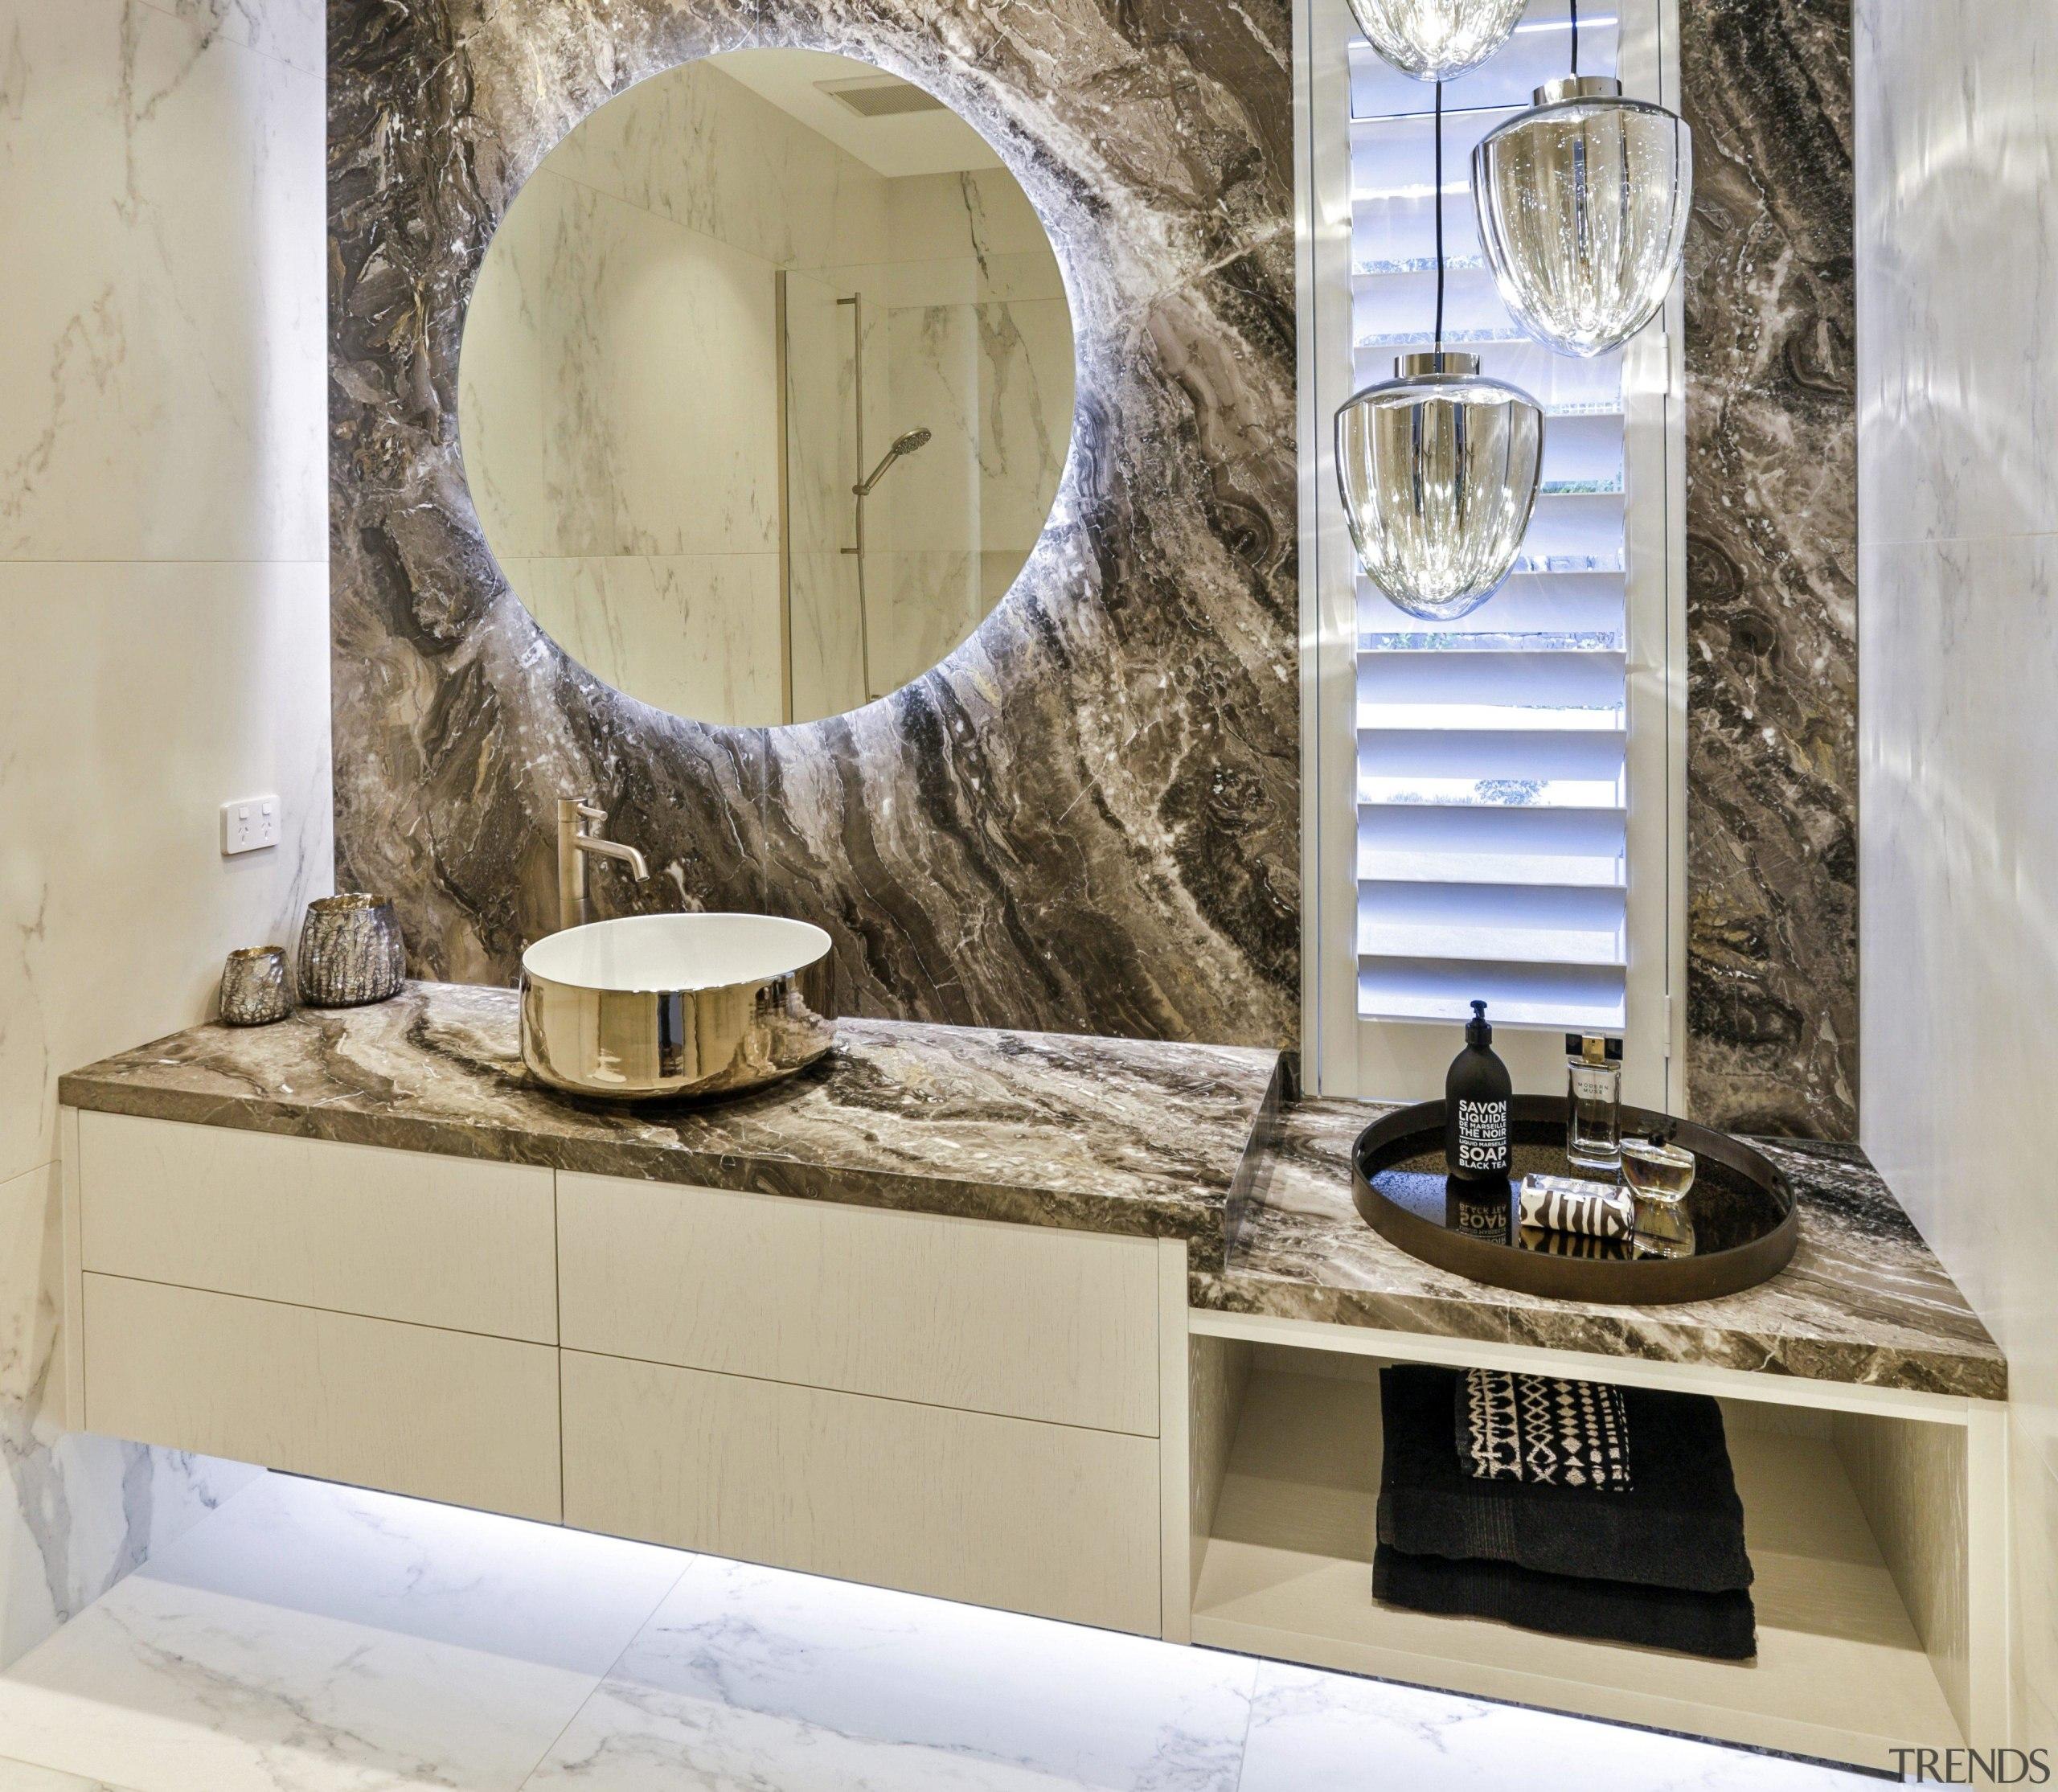 Dunlop Design – Runner-up –2019 TIDA New Zealand bathroom, bathroom accessory, bathroom cabinet, beige, ceramic, floor, flooring, furniture, interior design, marble, mirror, property, room, sink, tile, wall, wallpaper, gray